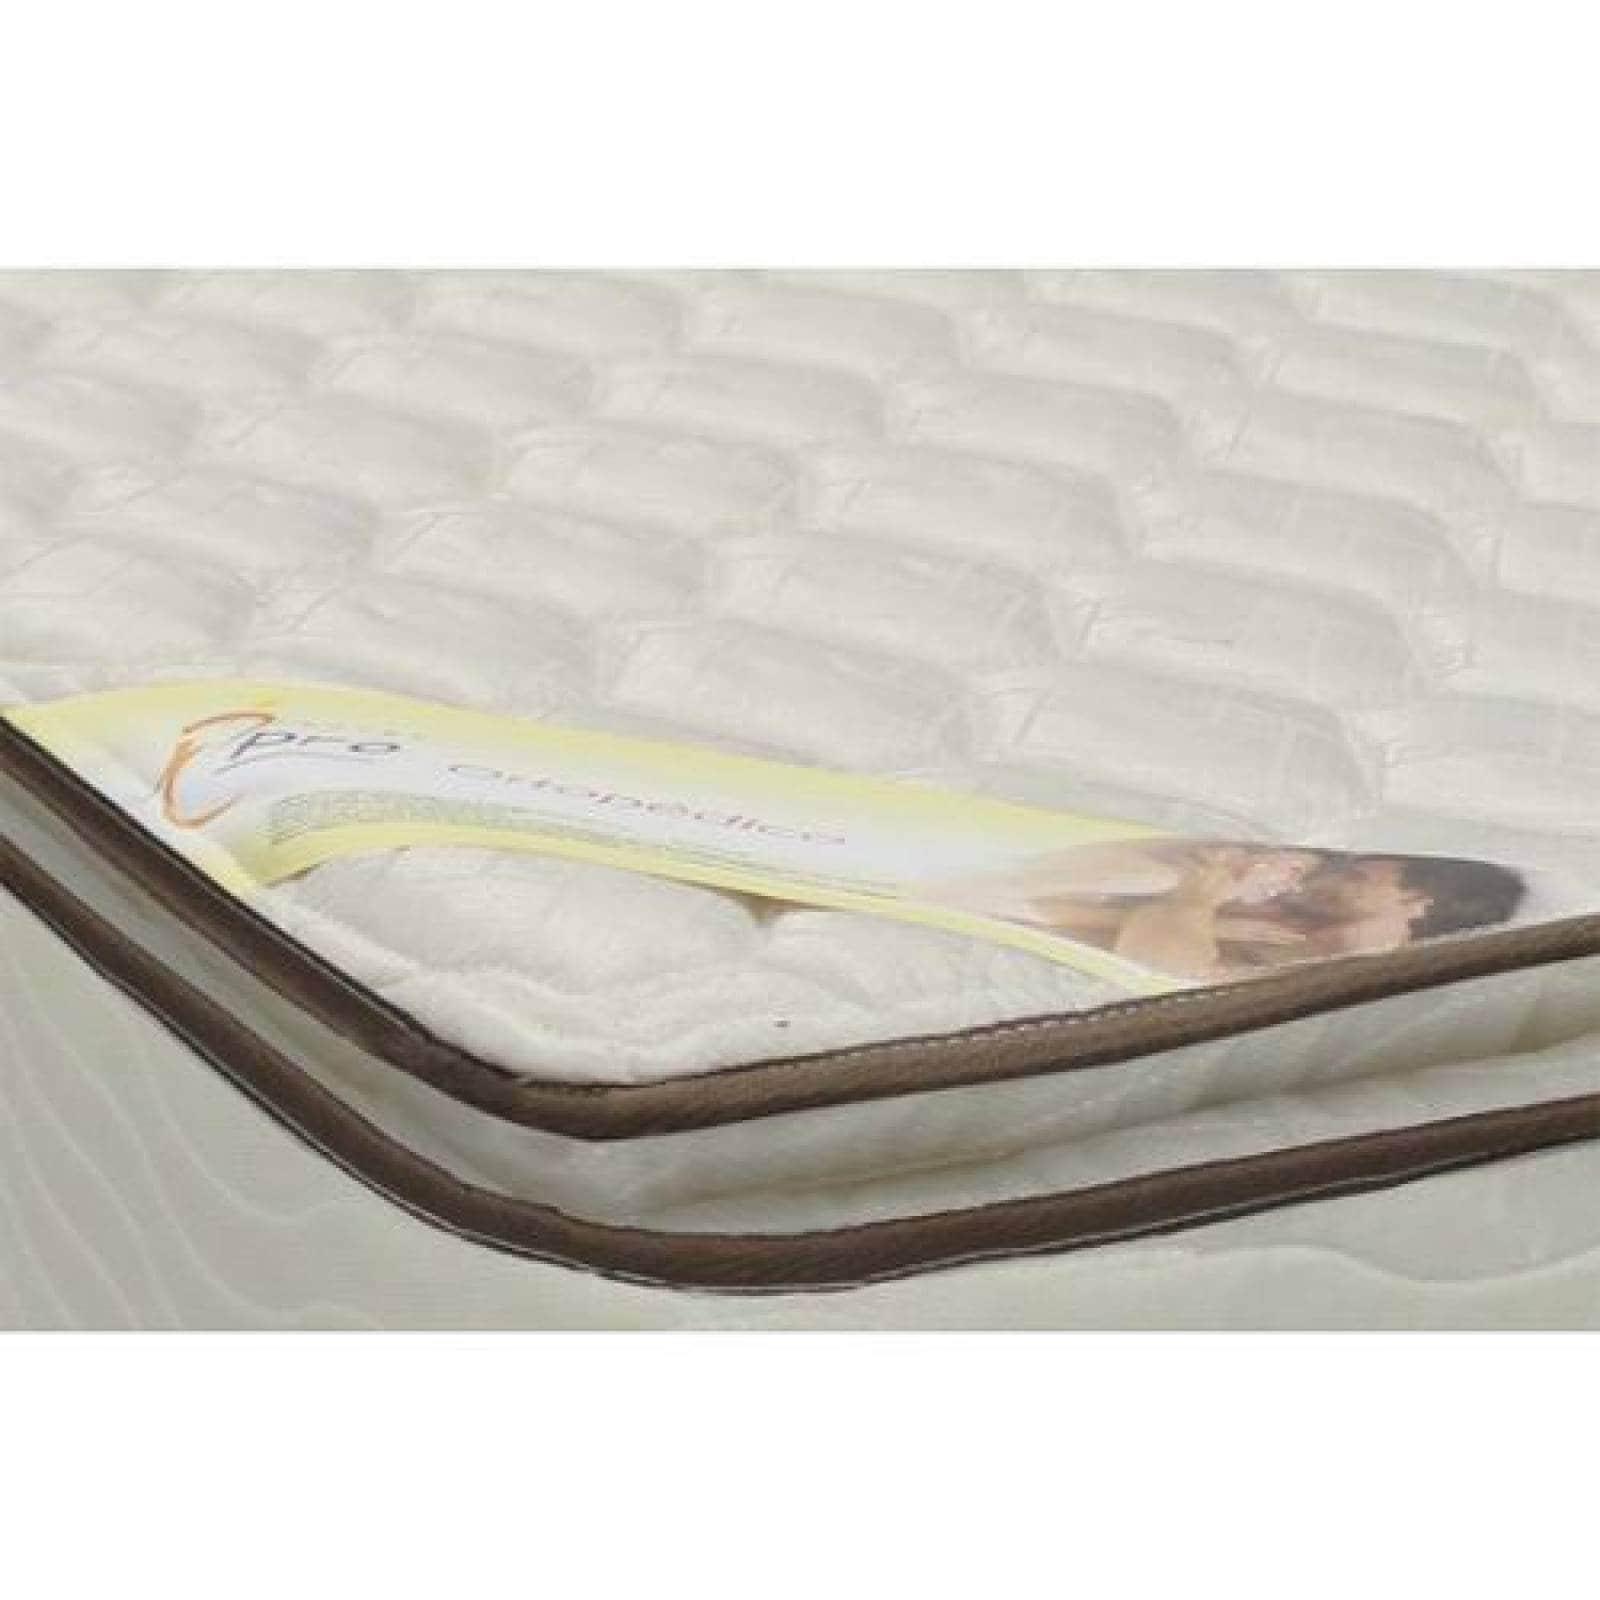 Colchon SuperOrtopedico Restonic Matrimonial SleepMart S/Box